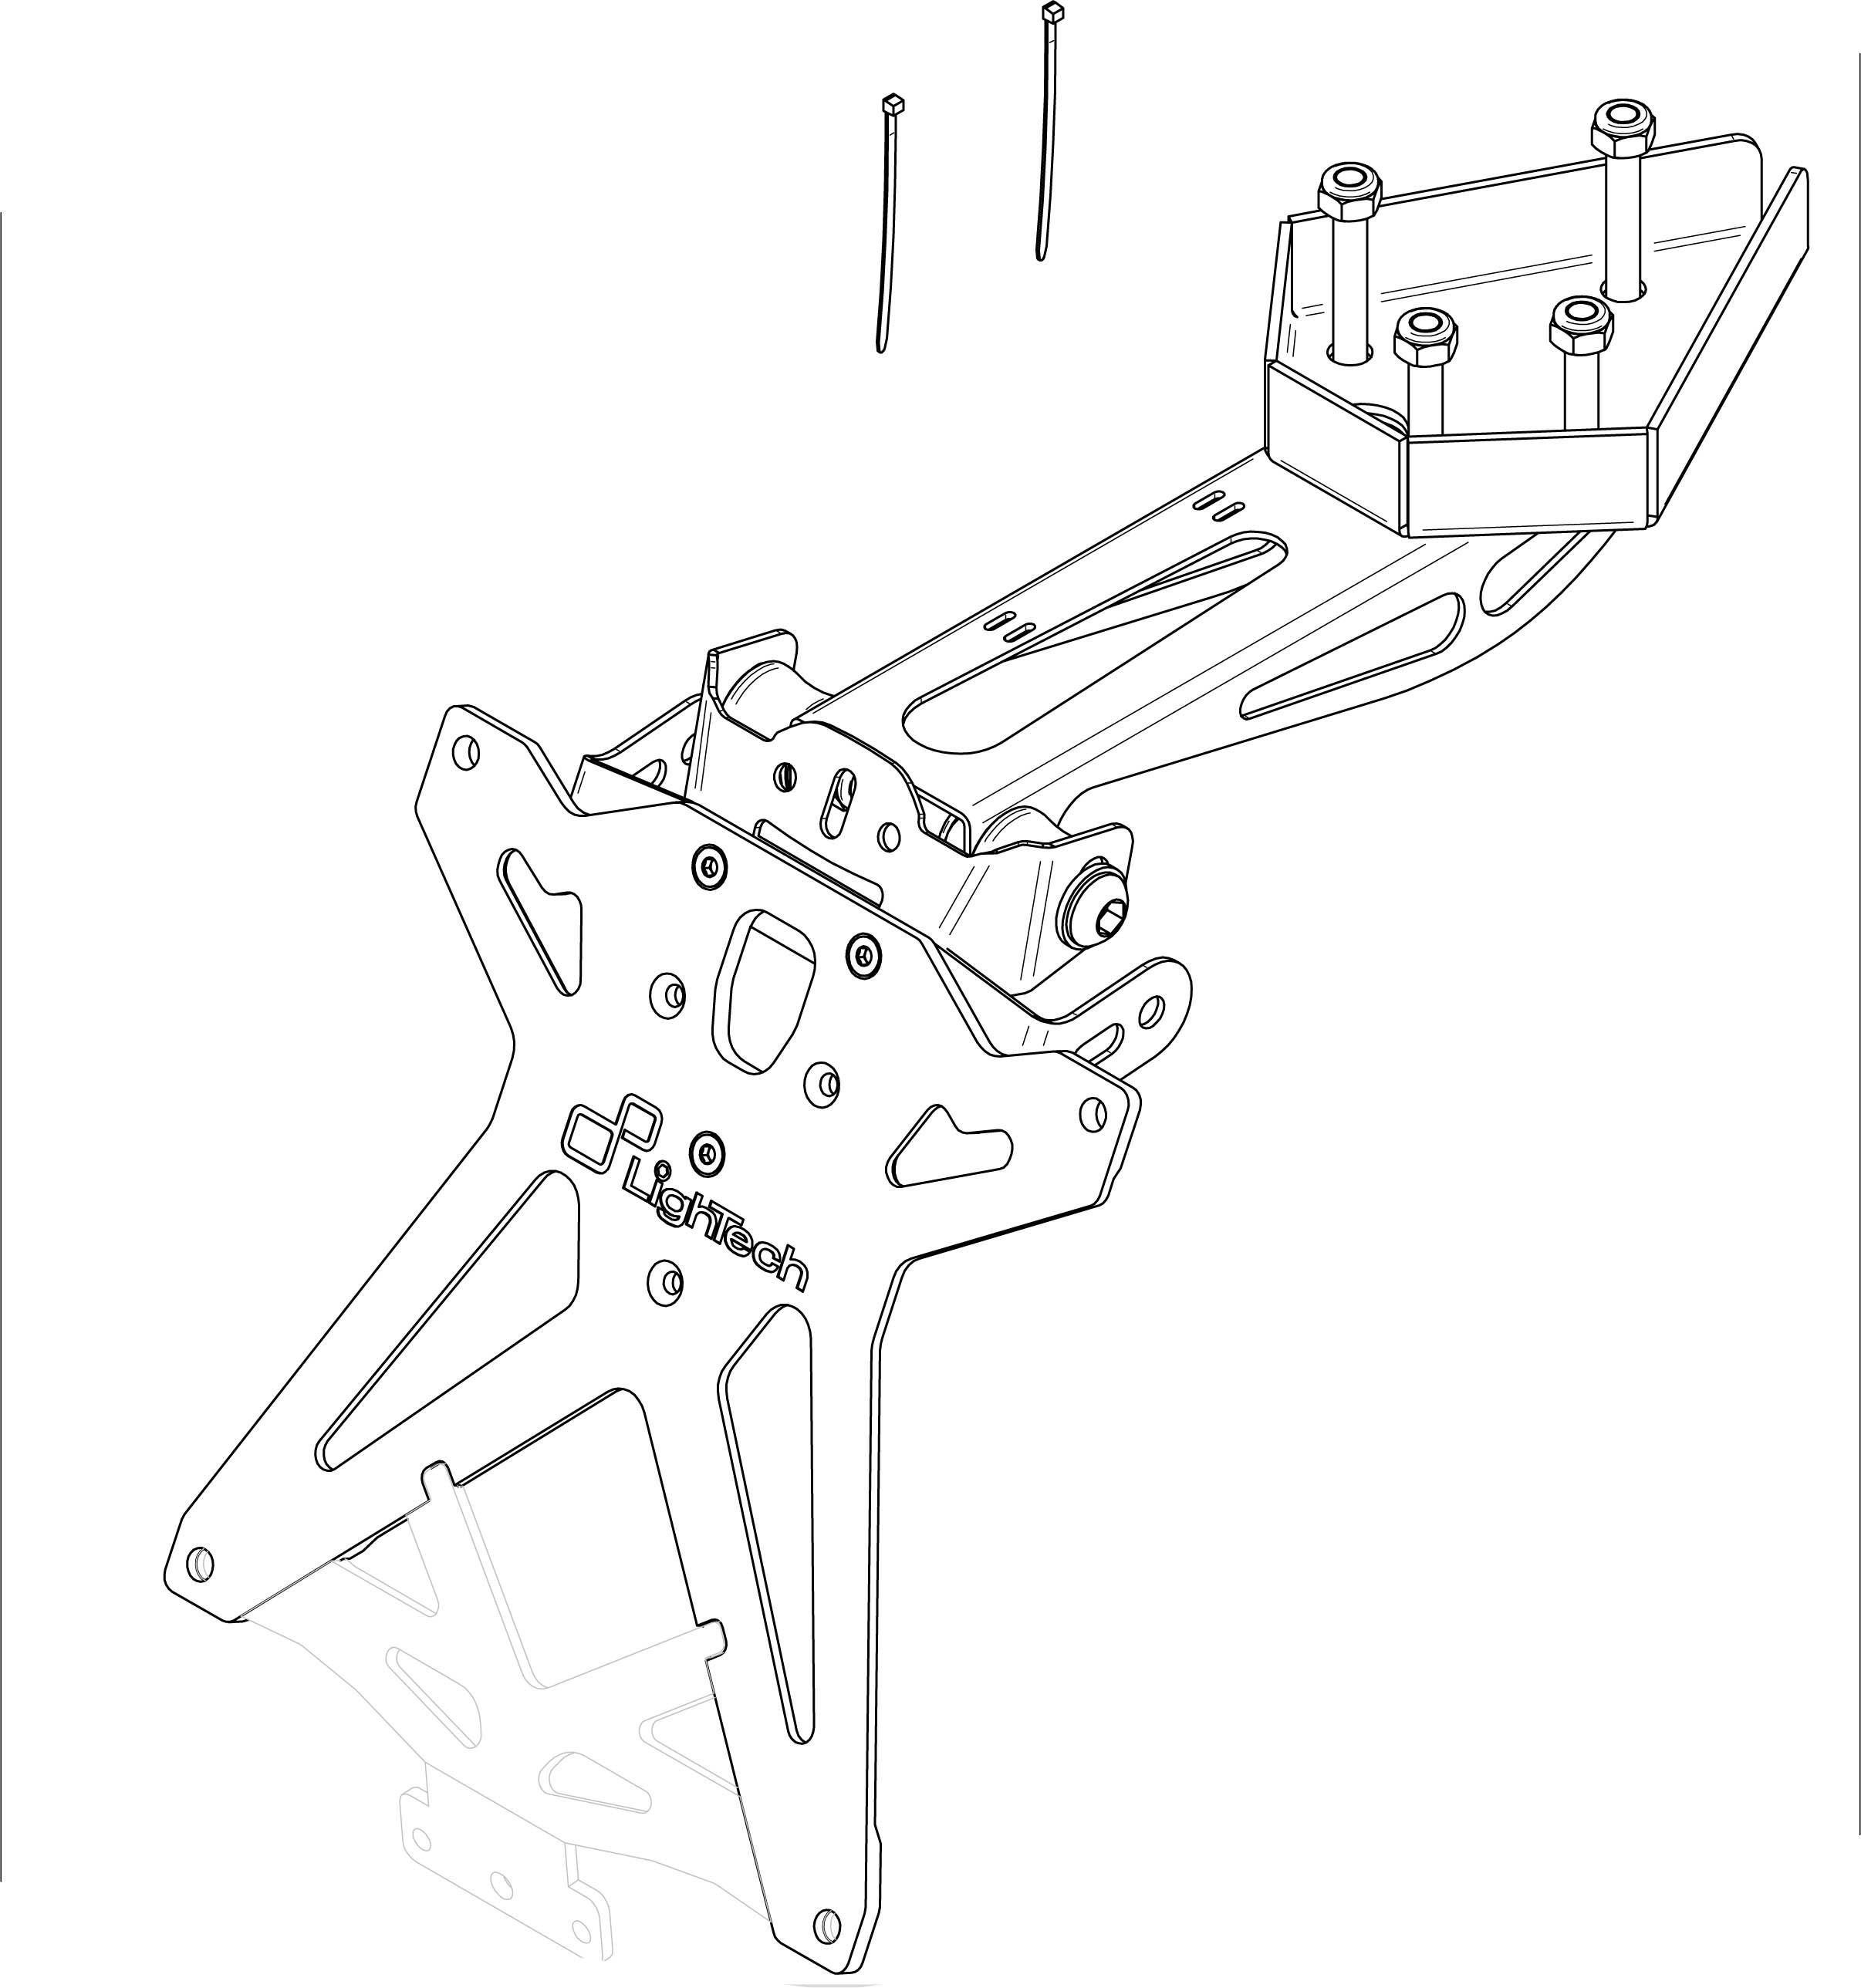 Portamatrículas Lightech para Triumph DAYTONA 675 13>